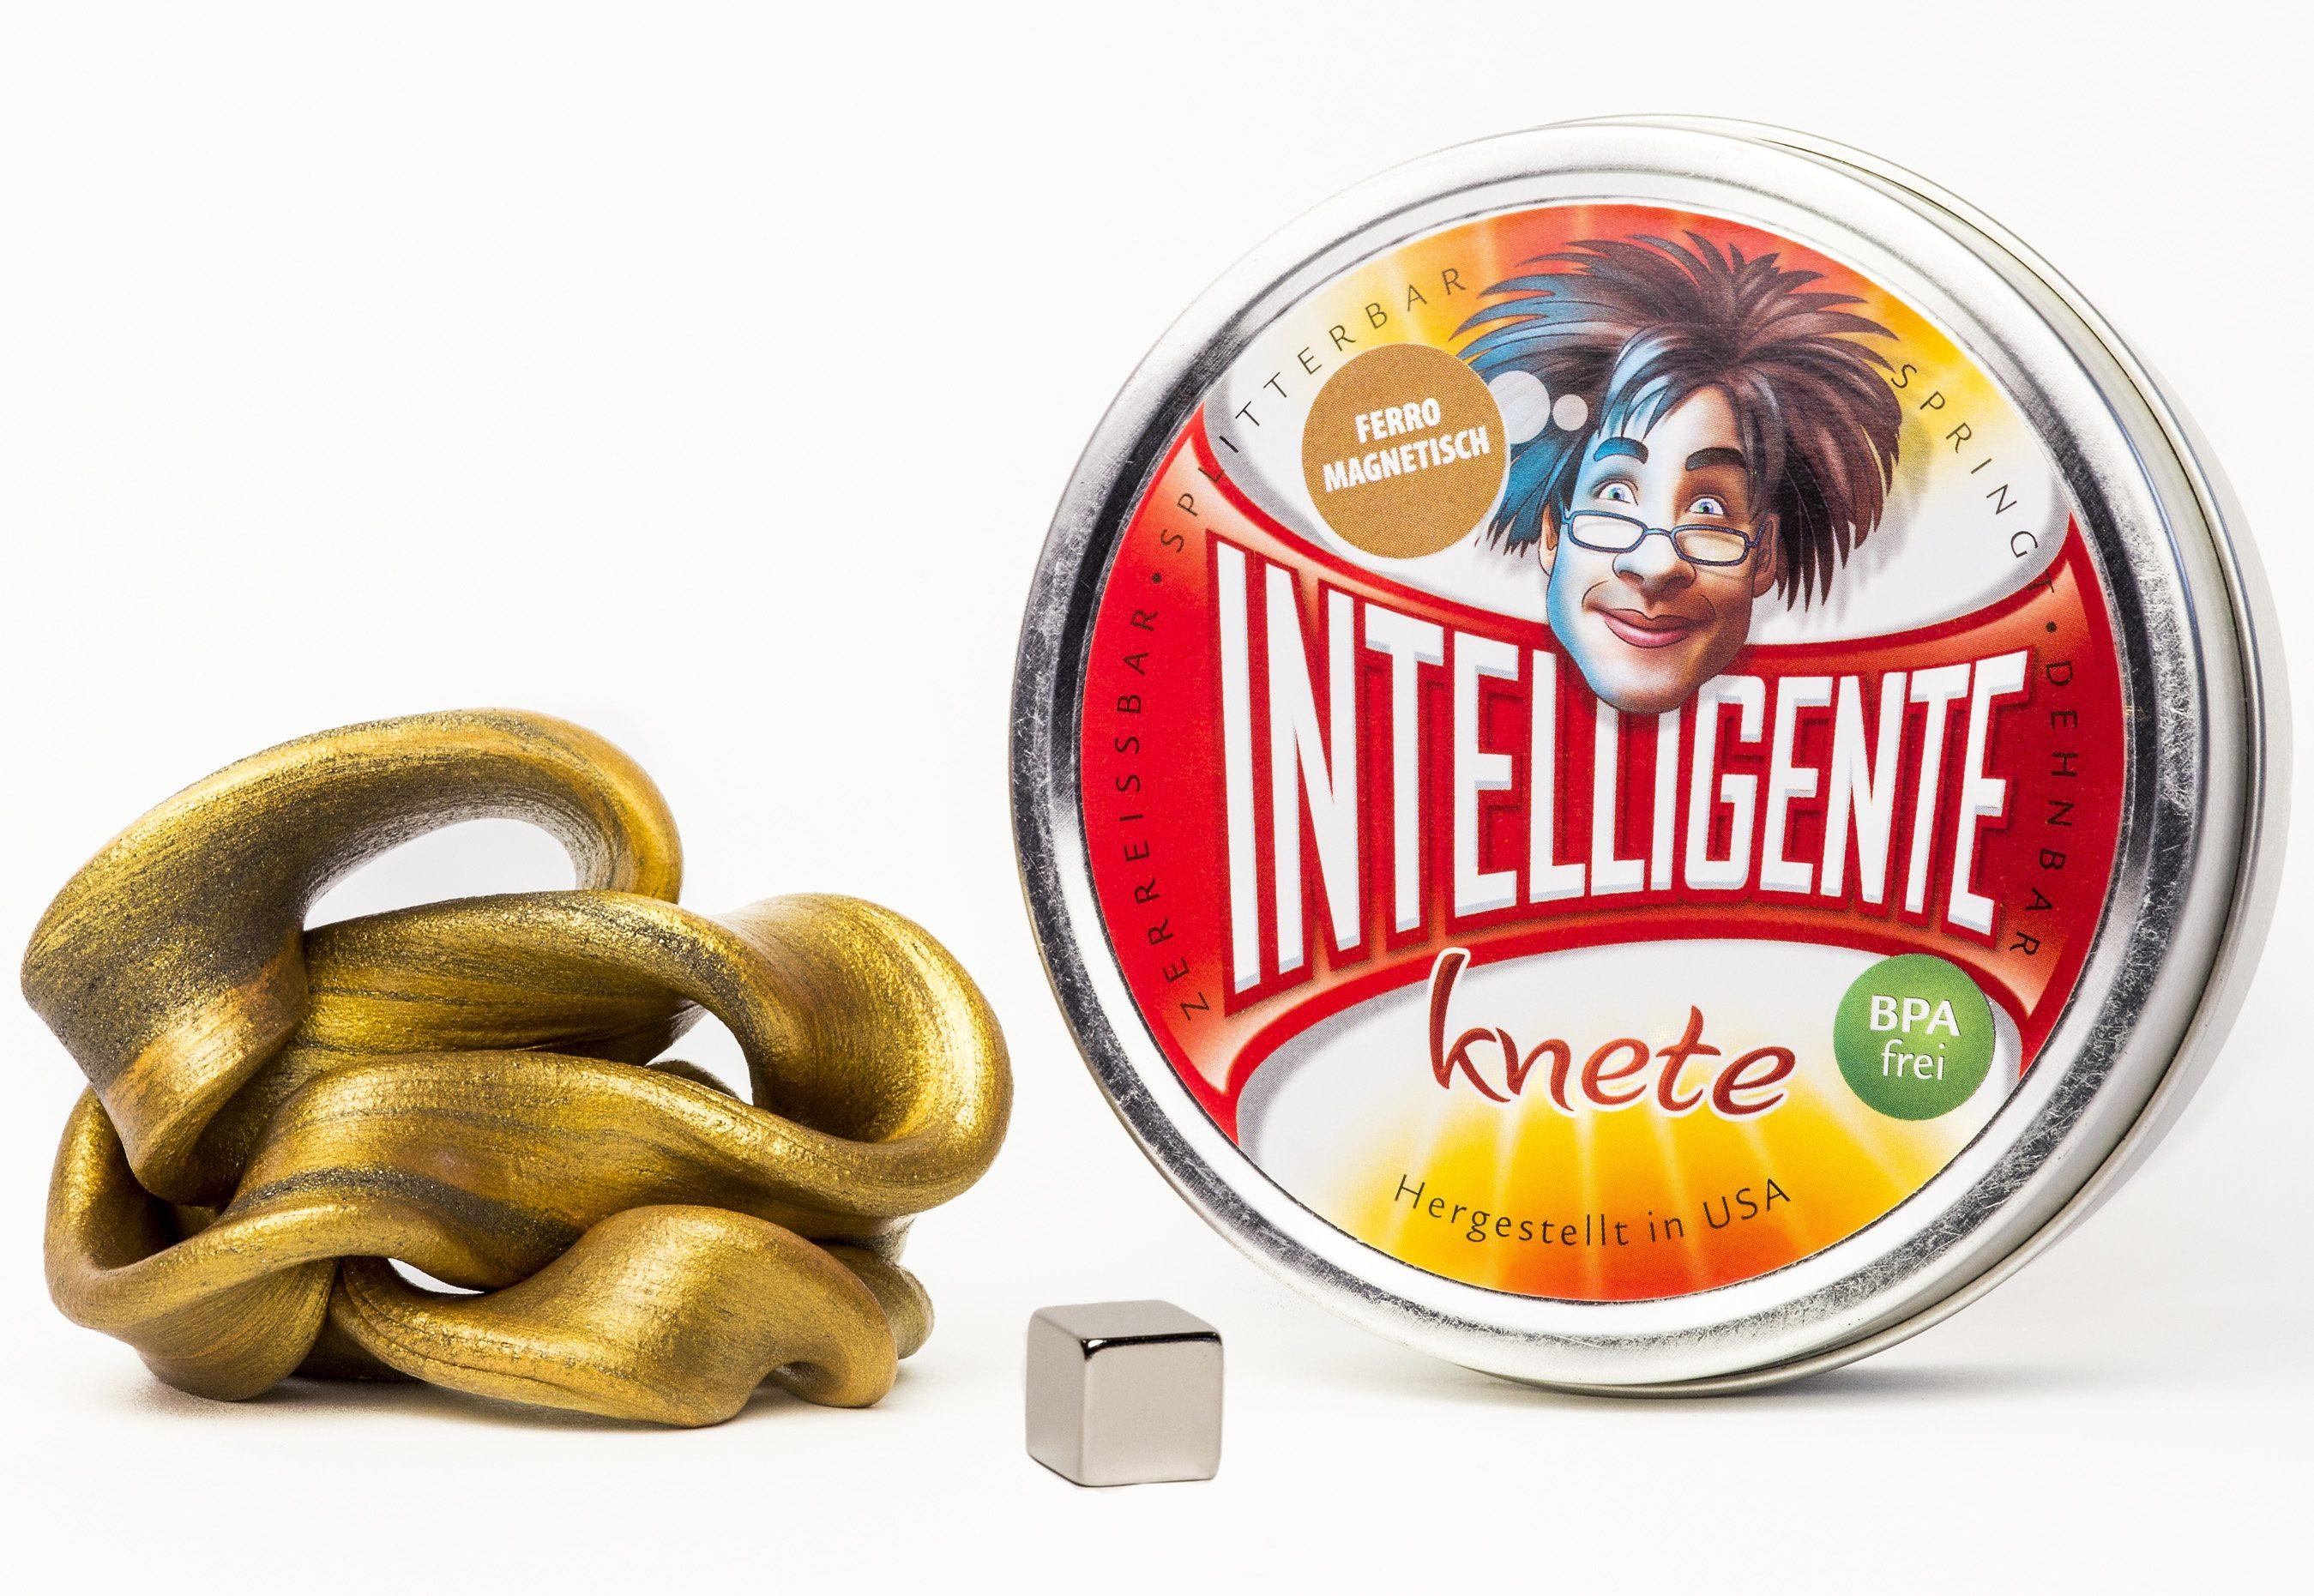 INTELLIGENTE knete Intelligente Knete Ferromagnetisch - Goldfarben, magnetisch goldfarben Kinder Kneten Modellieren Basteln, Malen, Kosmetik Schmuck